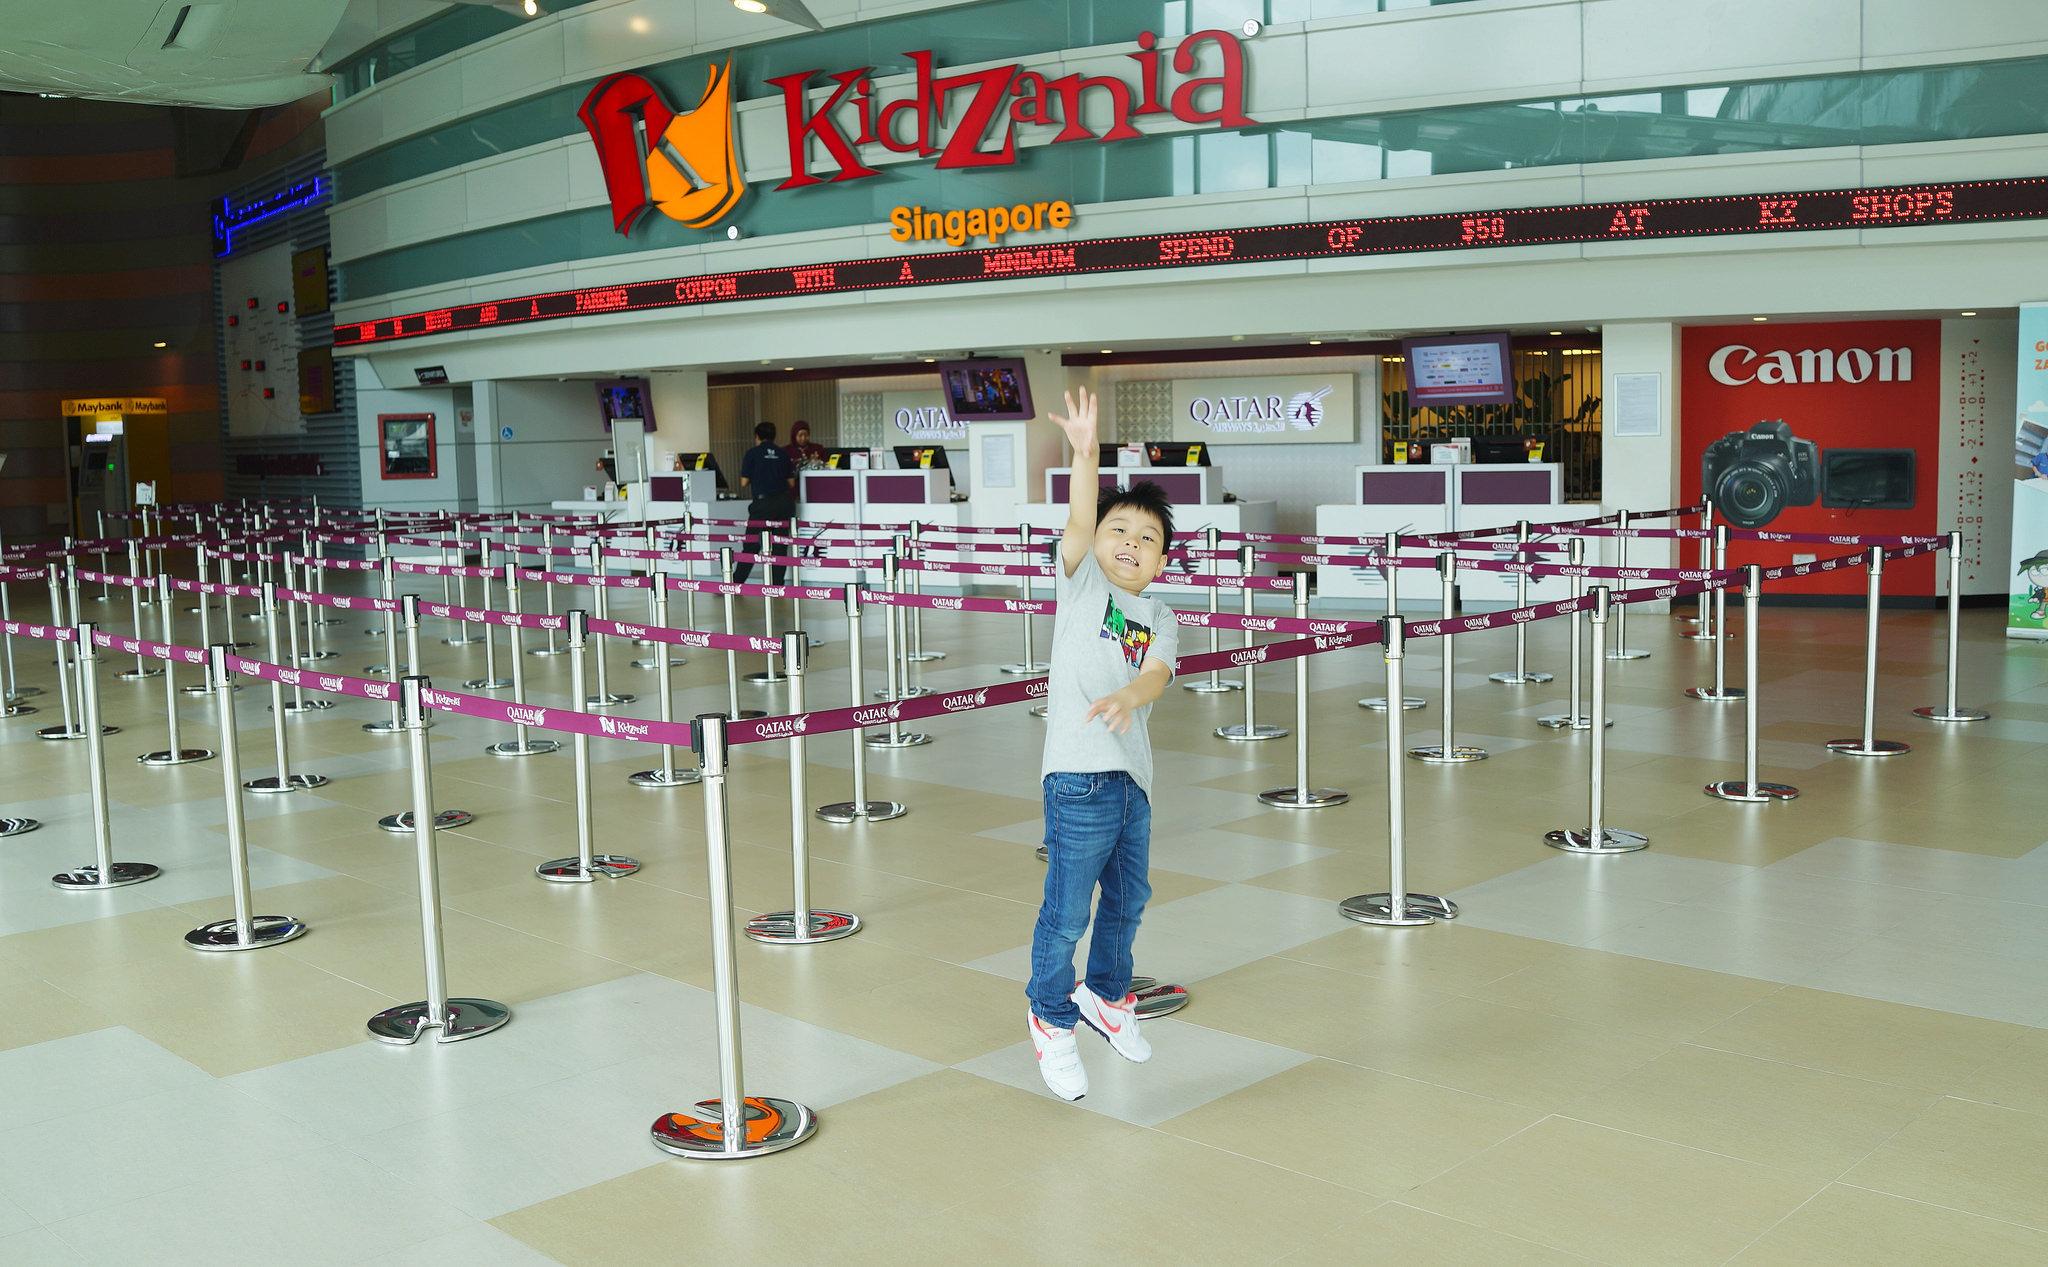 I Am A Canon Photojournalist At KidZania Singapore